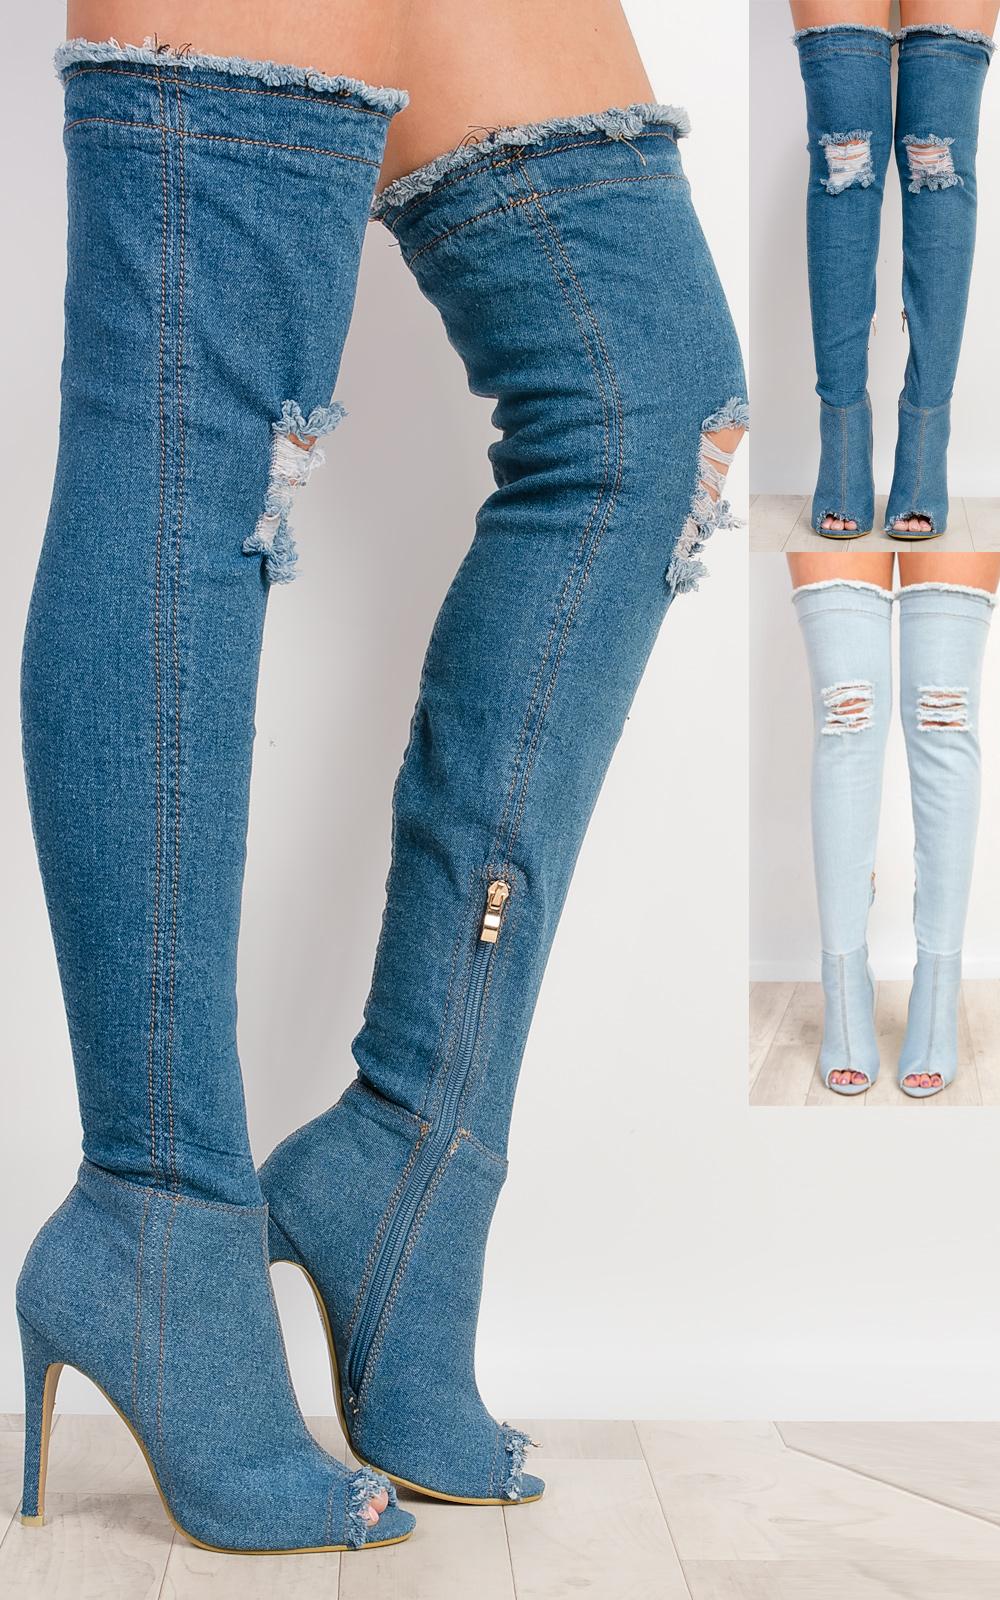 iKrush Ciara Denim Thigh High Boots